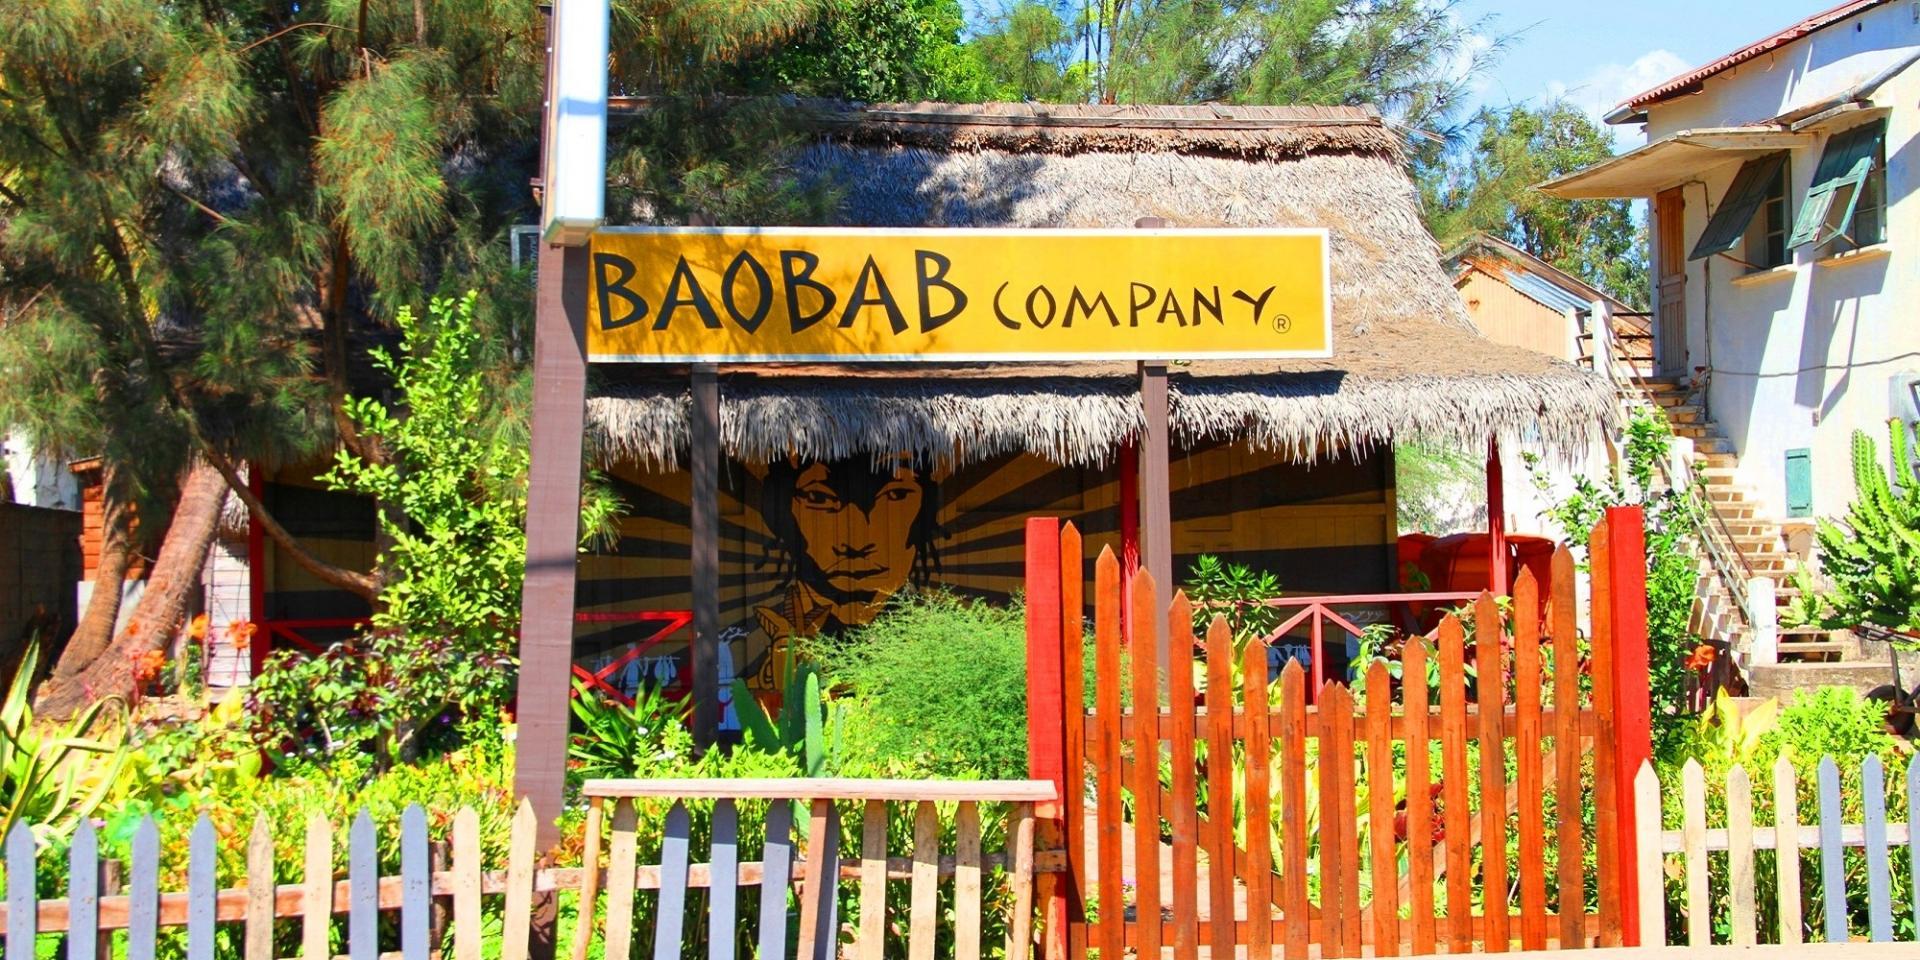 Baobab company 1